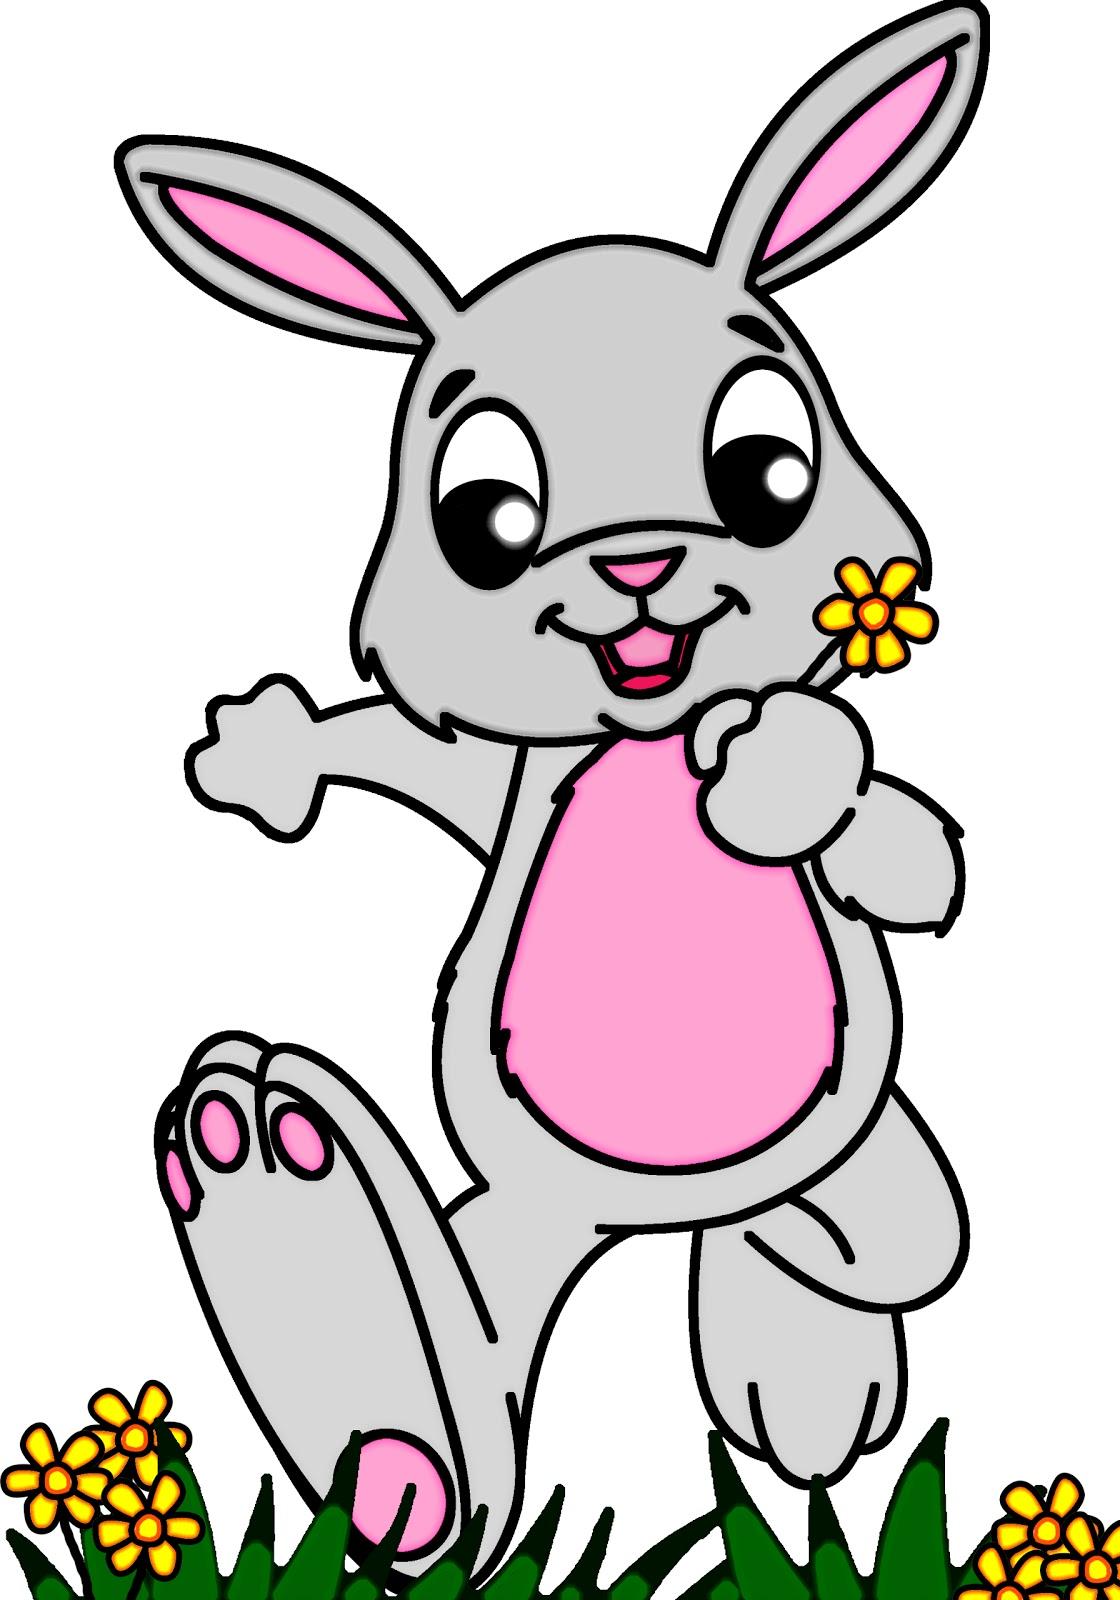 Classroom Treasures: Easter Bunny